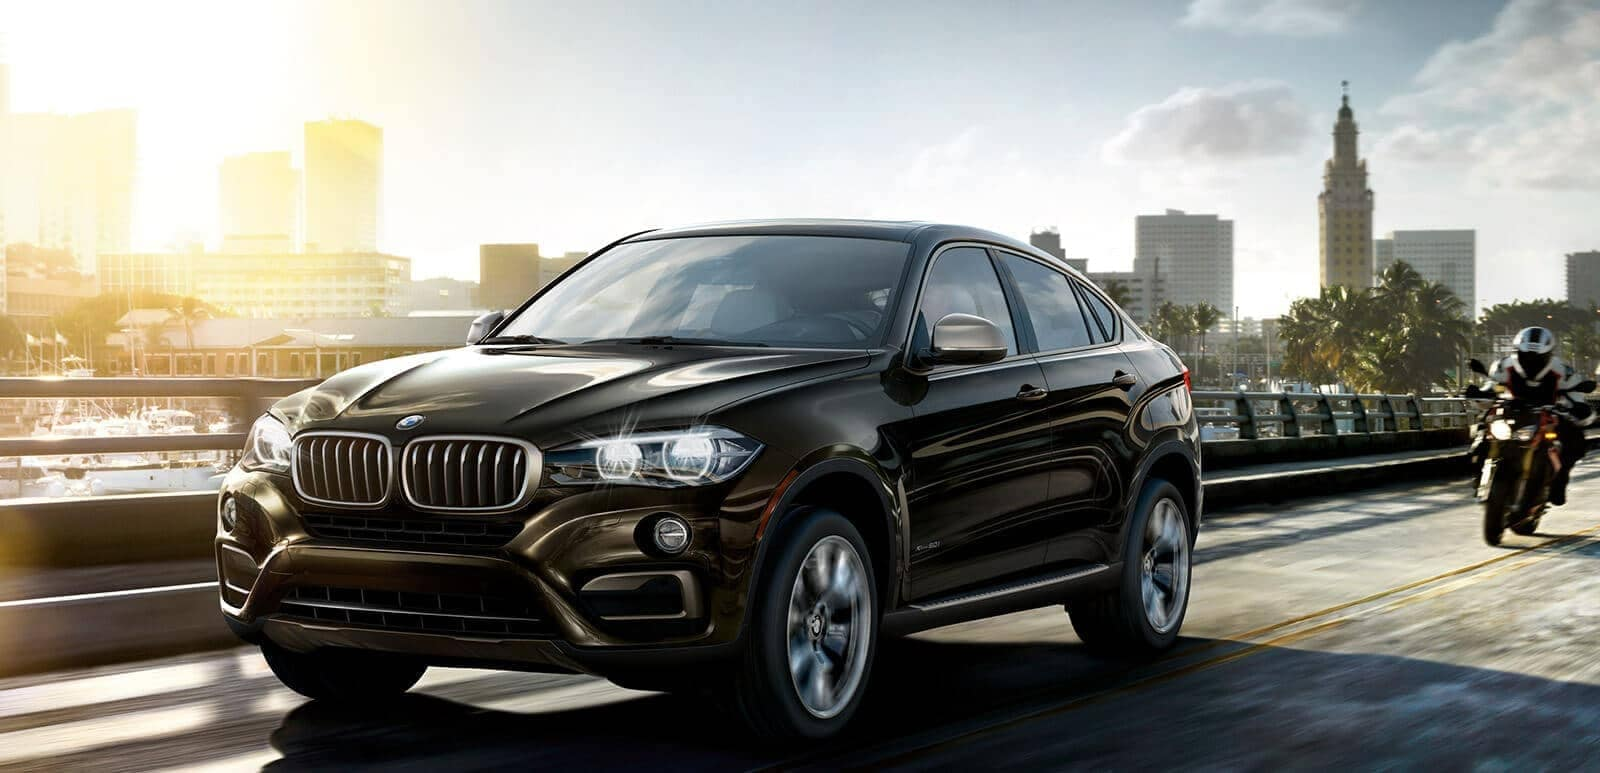 BMW_X-series_X6_2